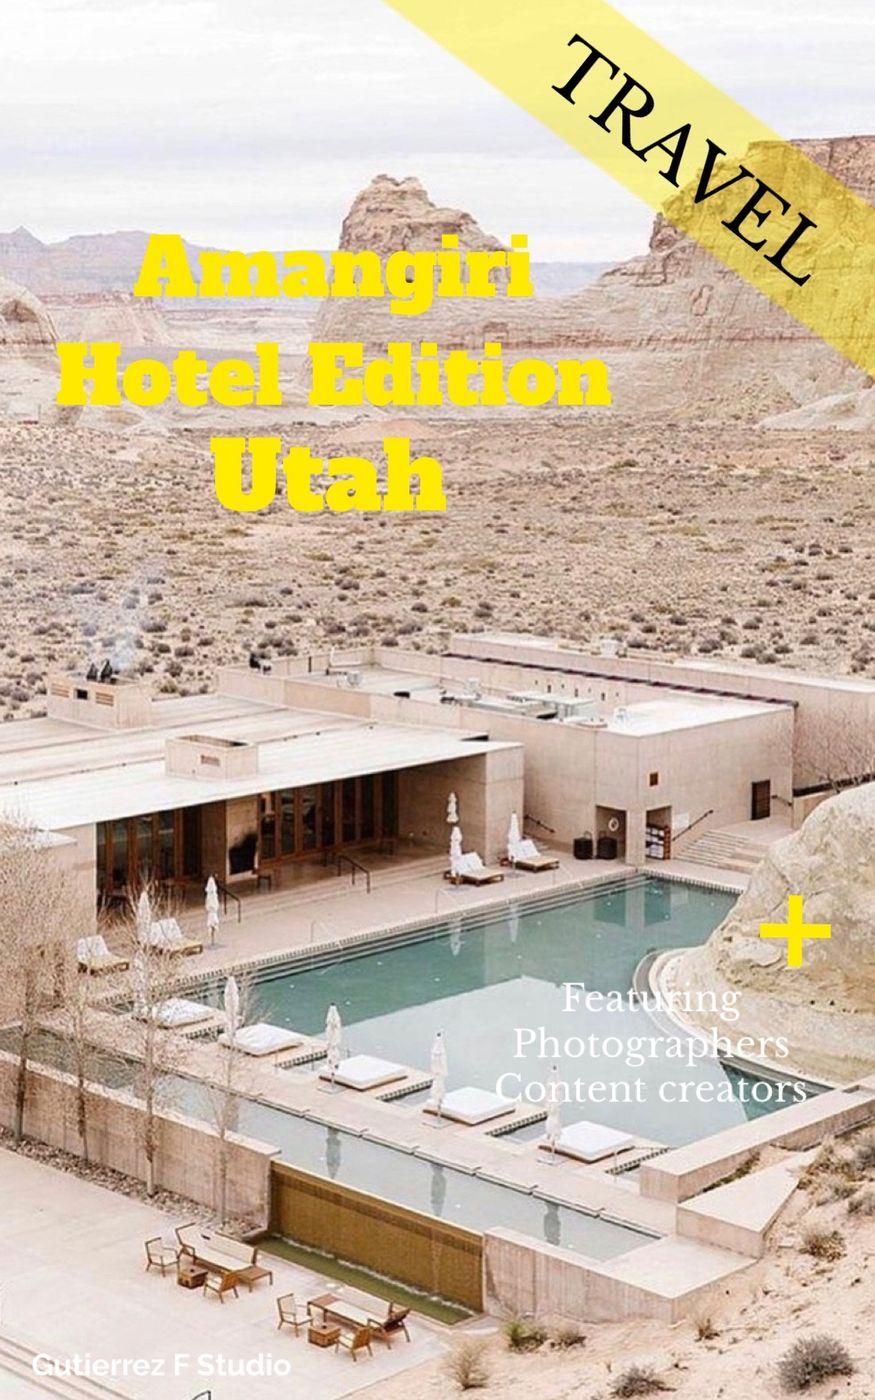 Featuring content creators and photographers | Hotel Amangiri, Utah